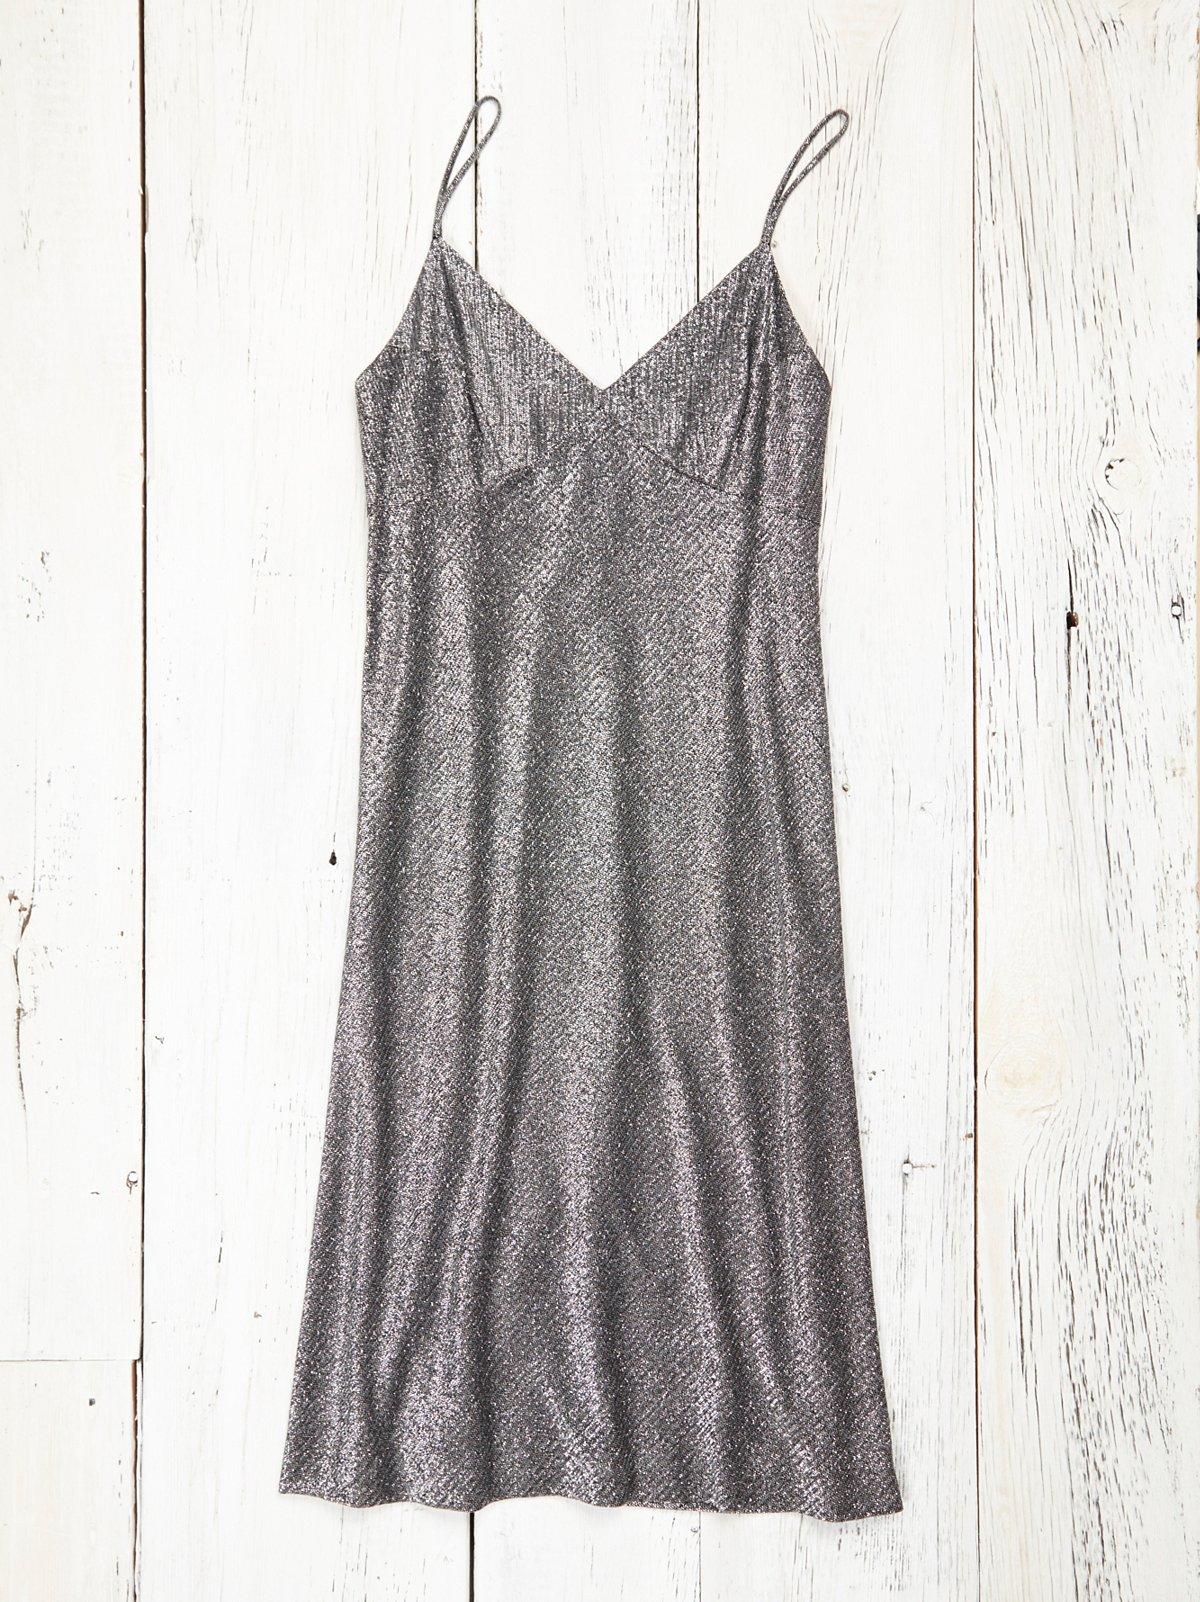 Vintage 1970s Metallic Dress